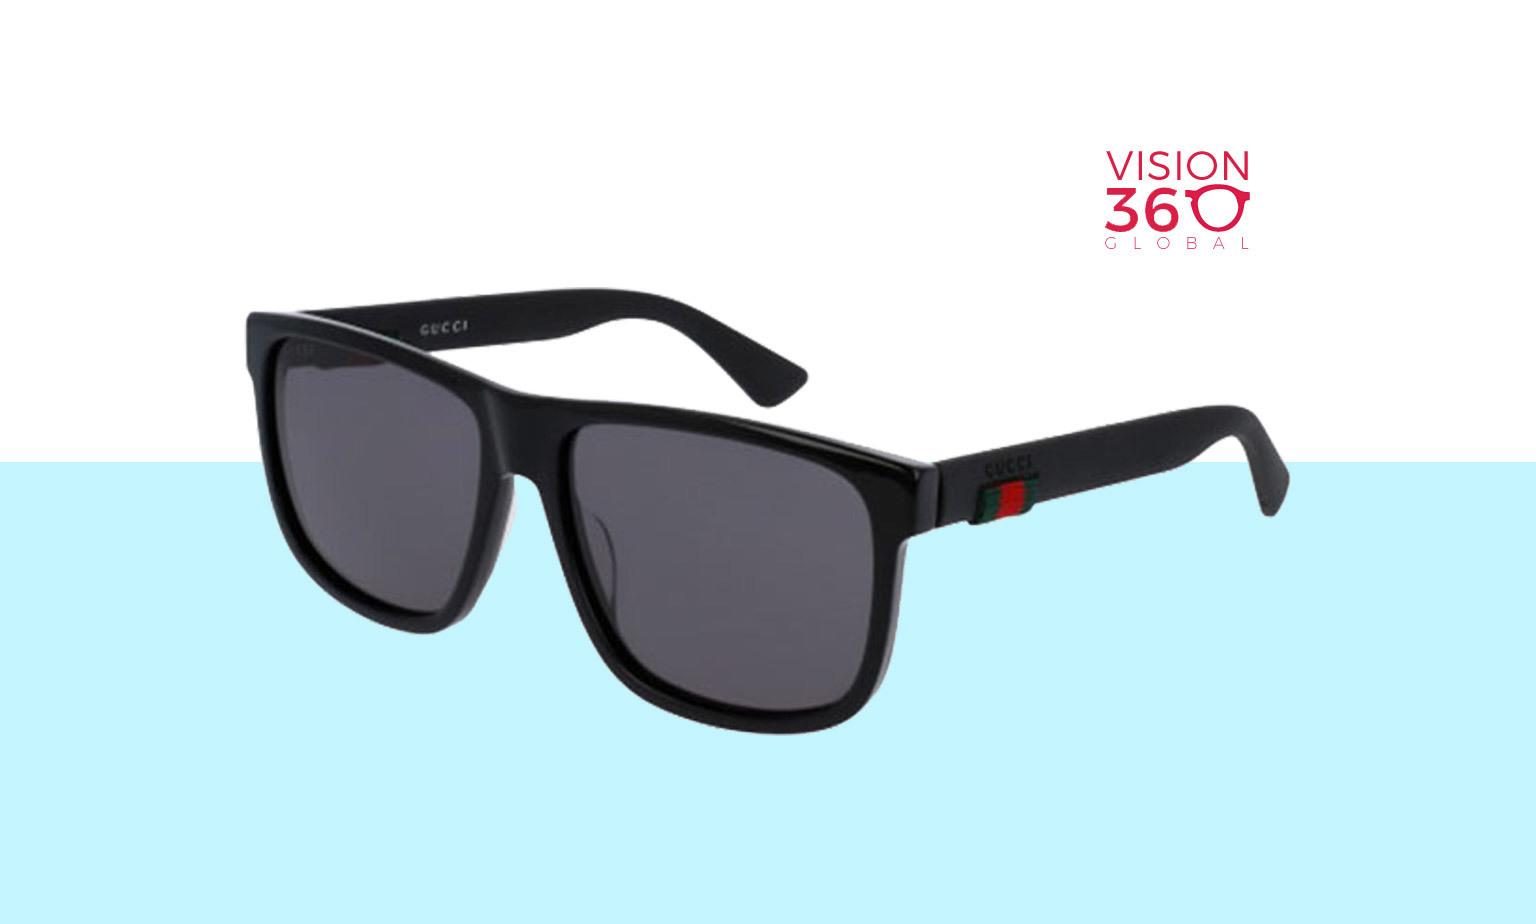 20% off at Vision 360 Global*